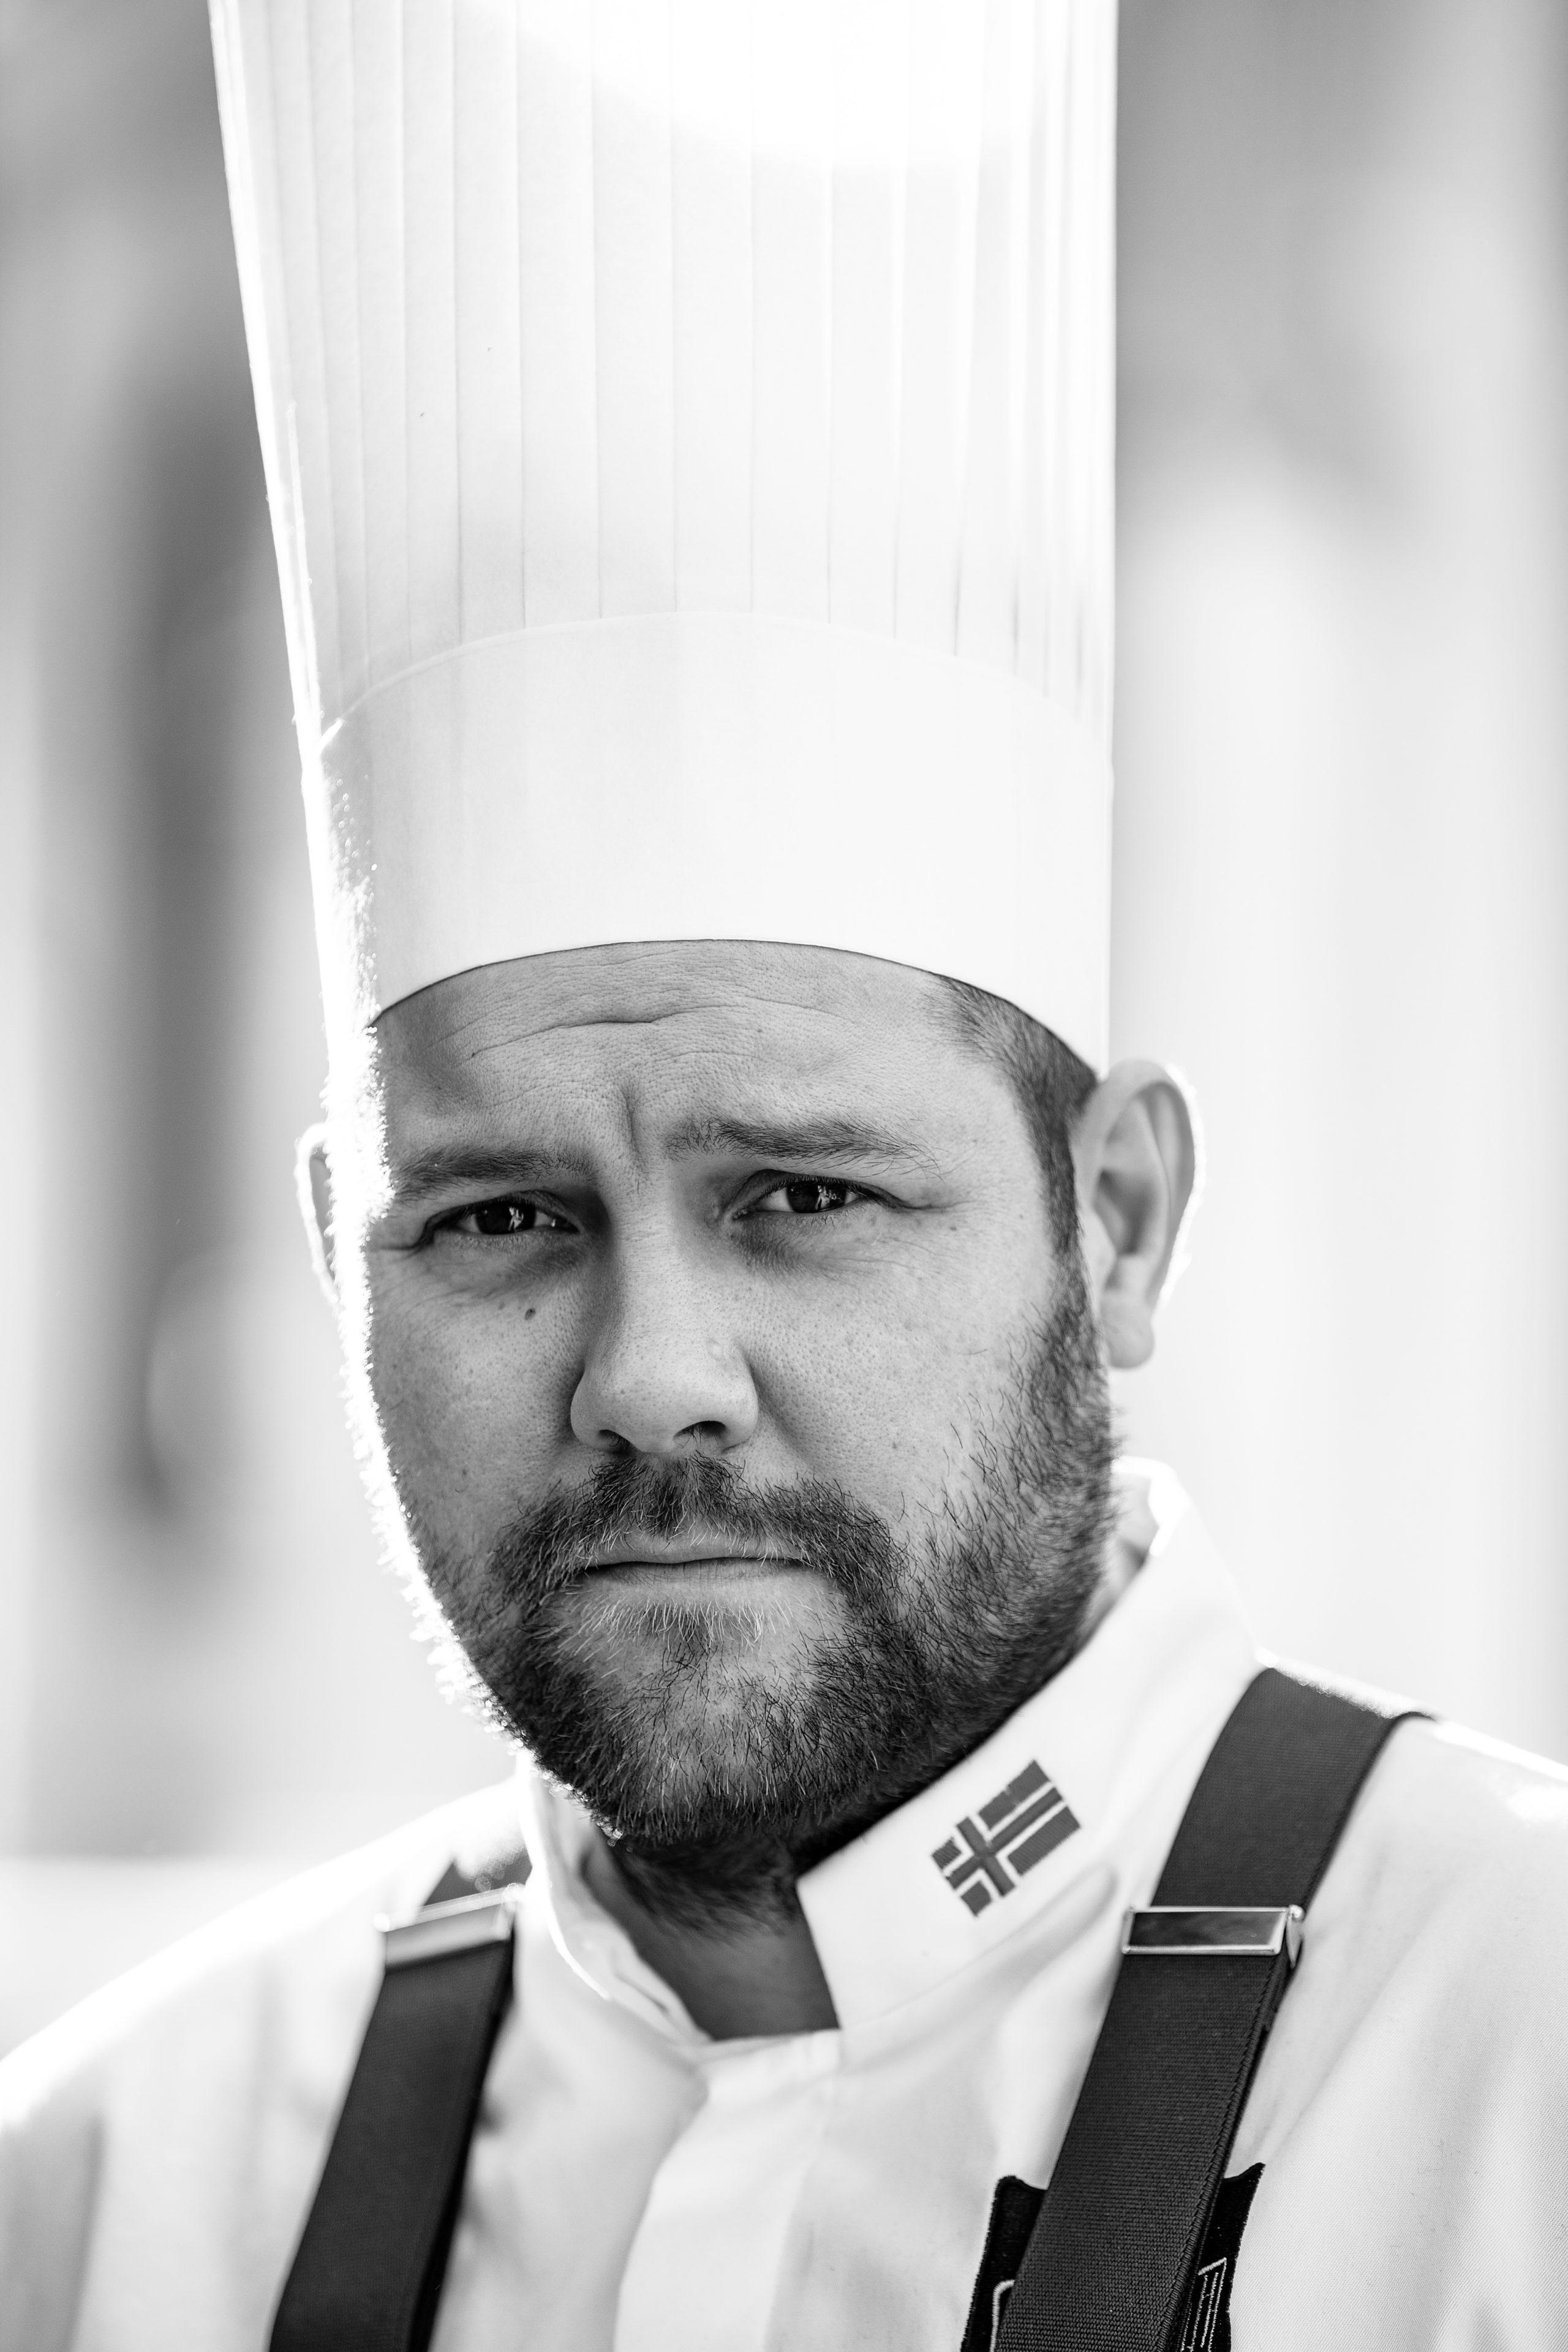 Christopher Davidsen, head chef at the Michelin-restaurant